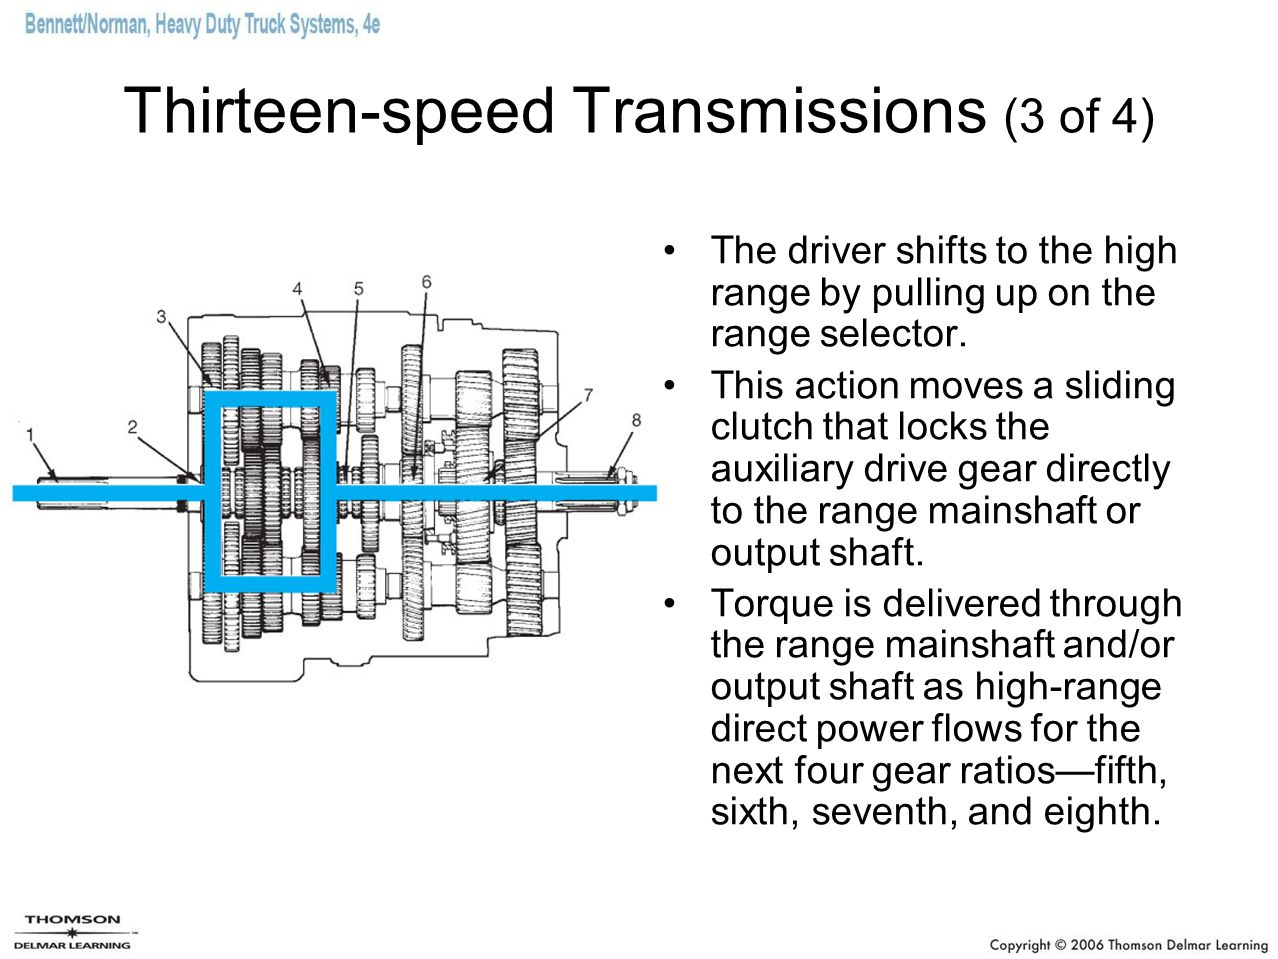 Standard Transmissions Ppt Download Stick Shift Shifting Gears Illustration Diagram Thirteen Speed 3 Of 4